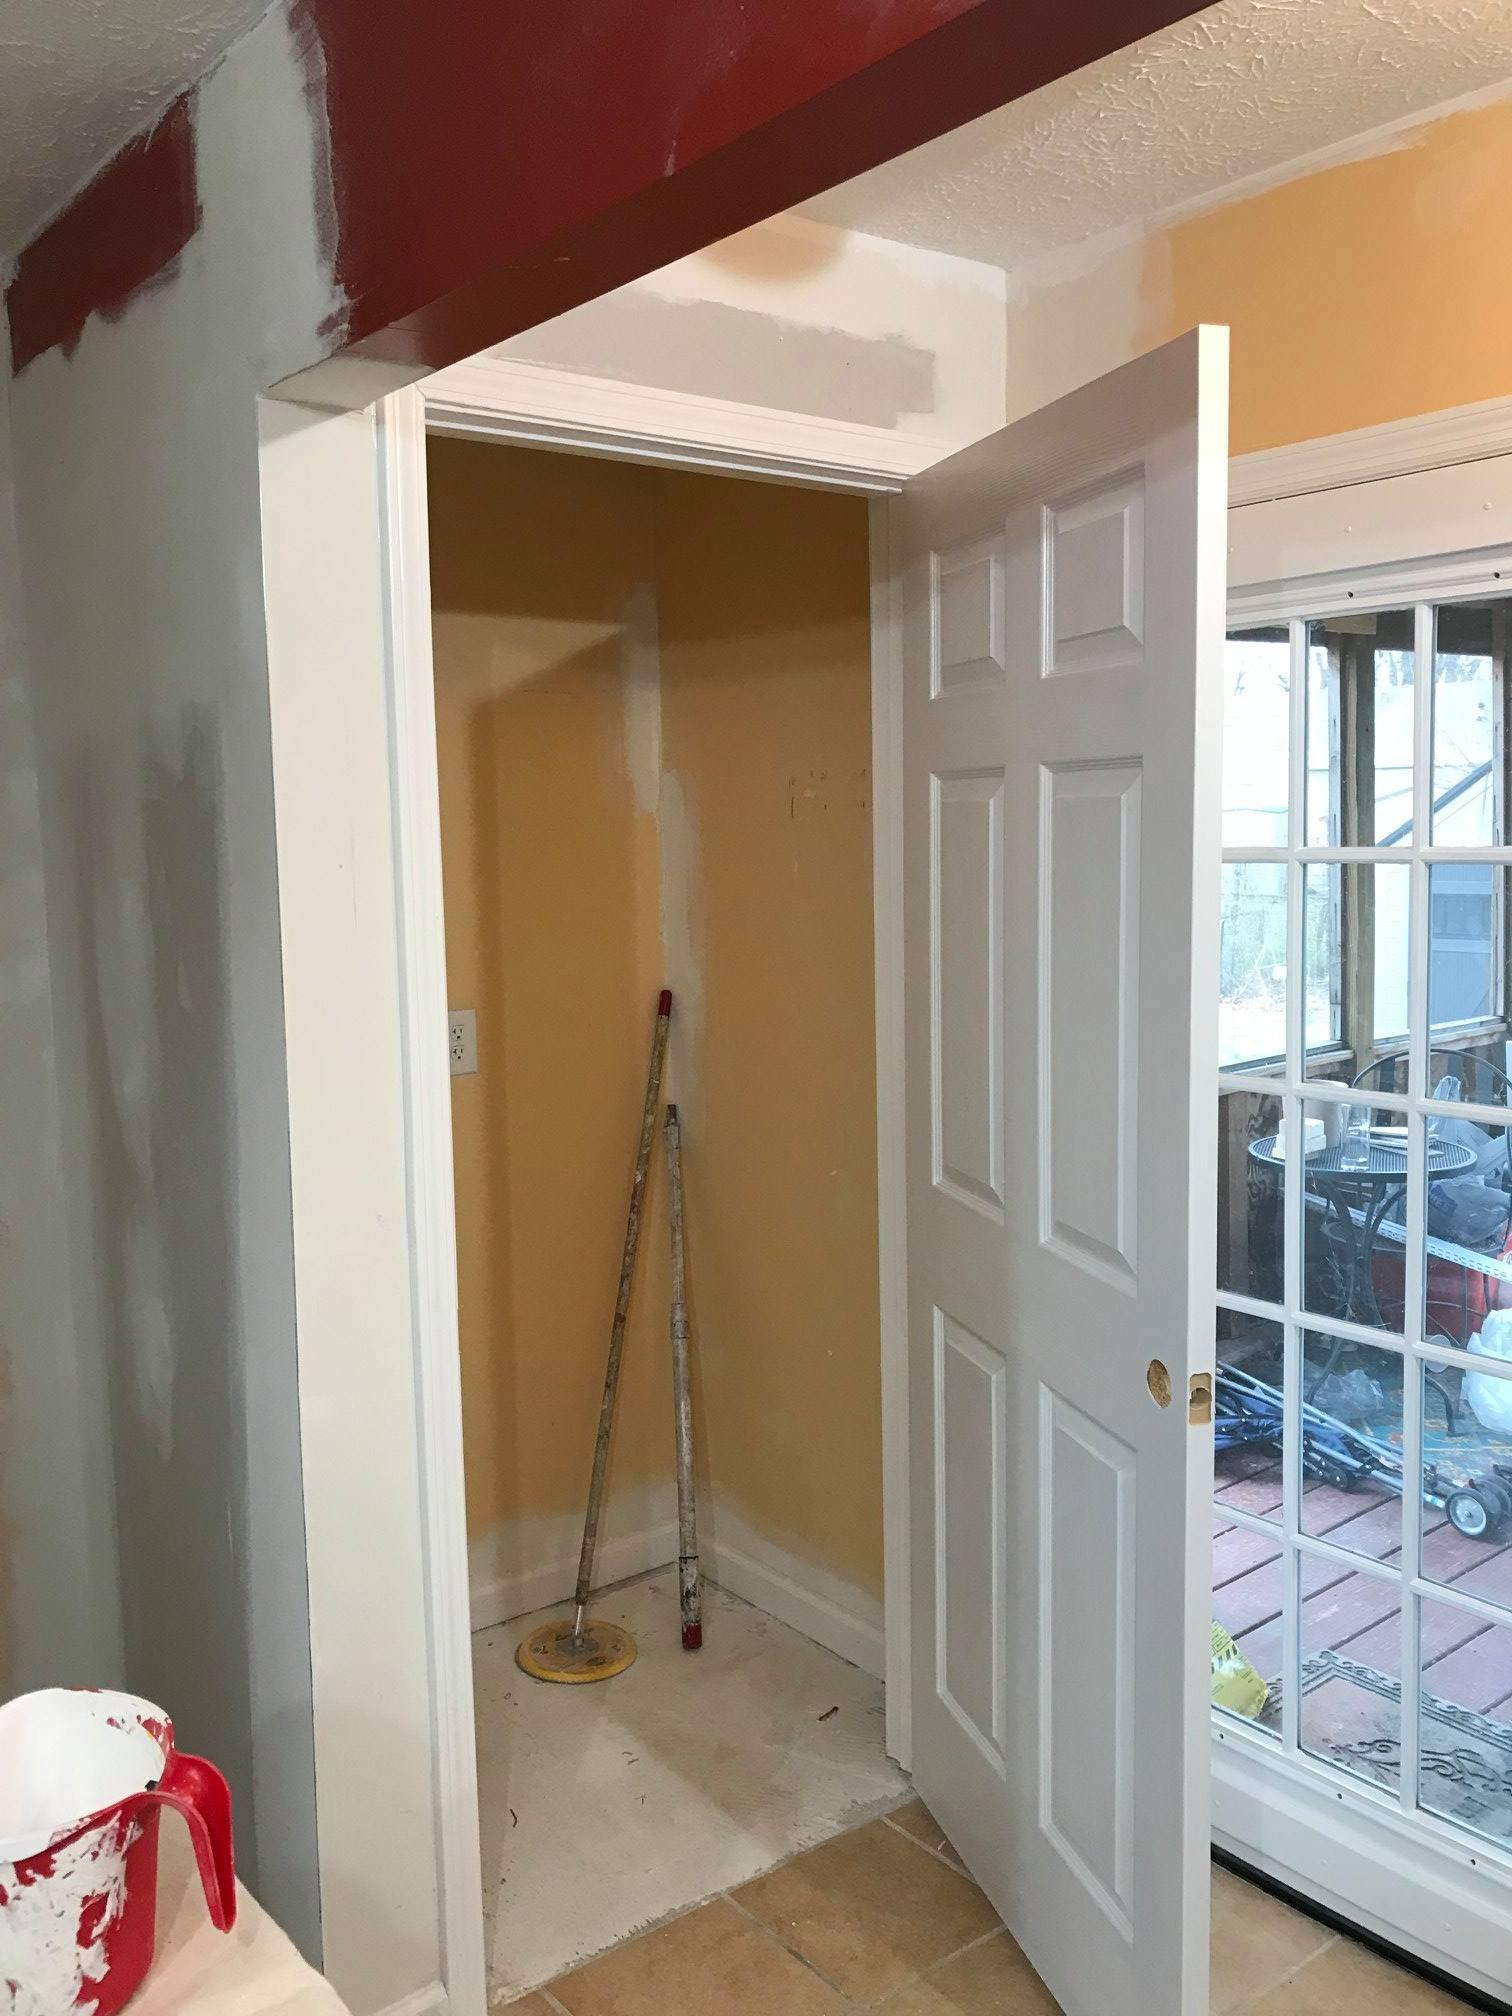 Kitchen Pantry Build (In Progress)